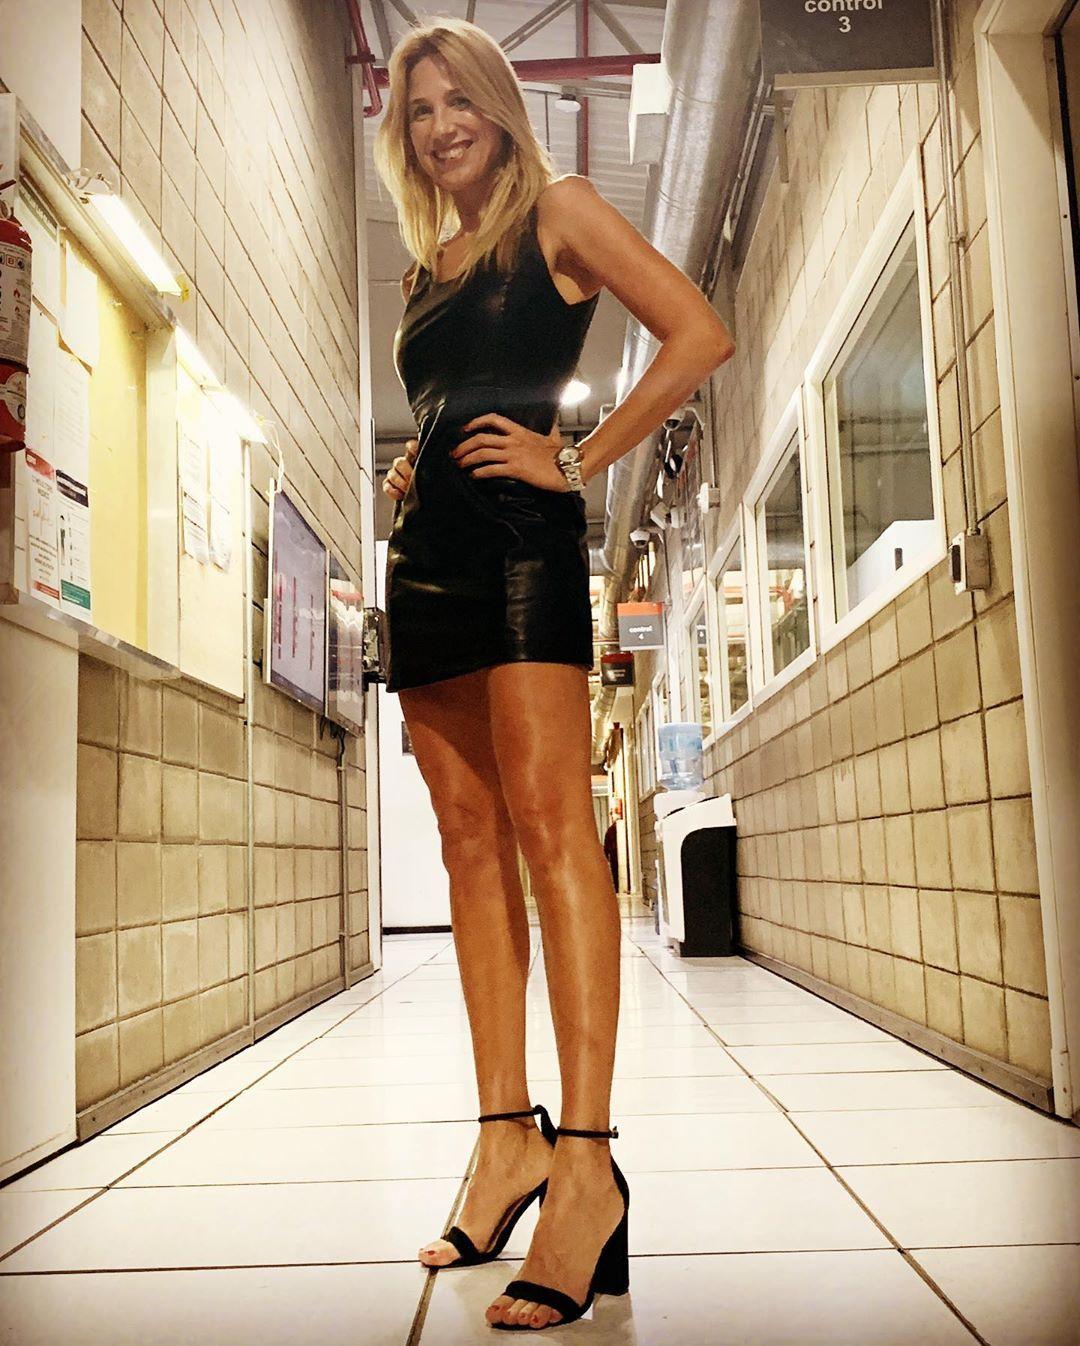 Alina-Moine-Feet-4876979.jpg